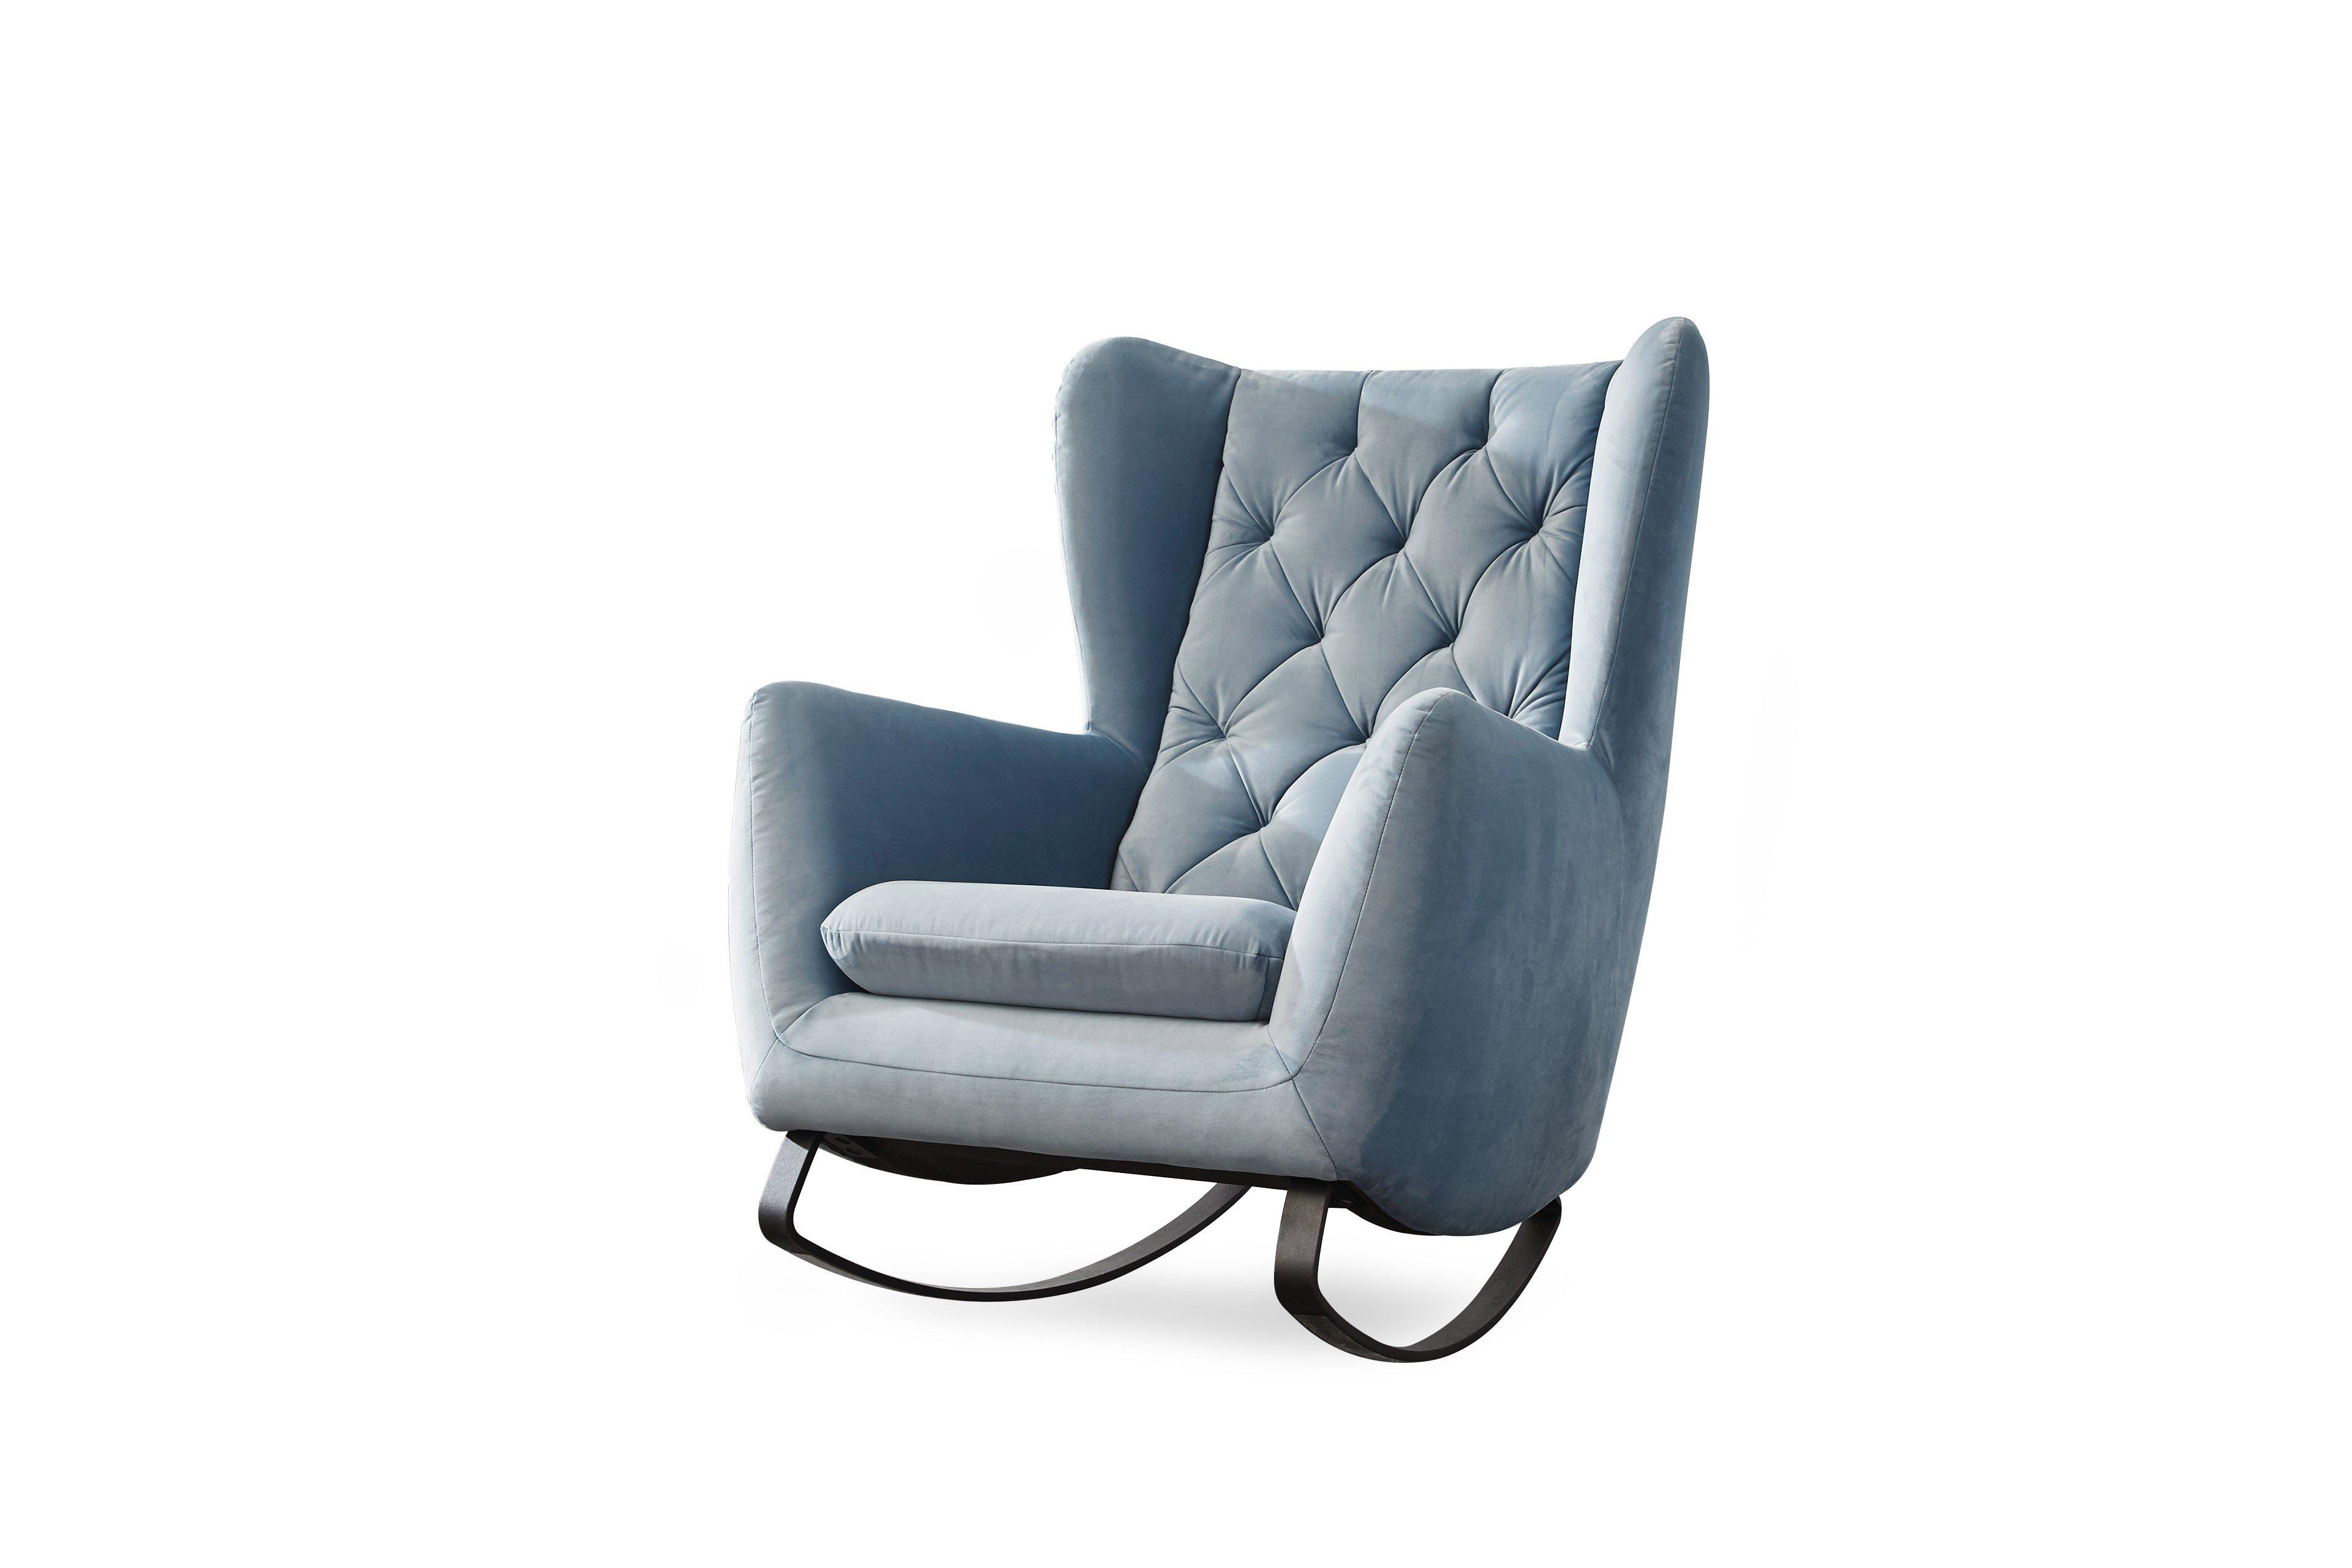 candy polsterm bel sixty schaukelsessel hellblau m bel letz ihr online shop. Black Bedroom Furniture Sets. Home Design Ideas